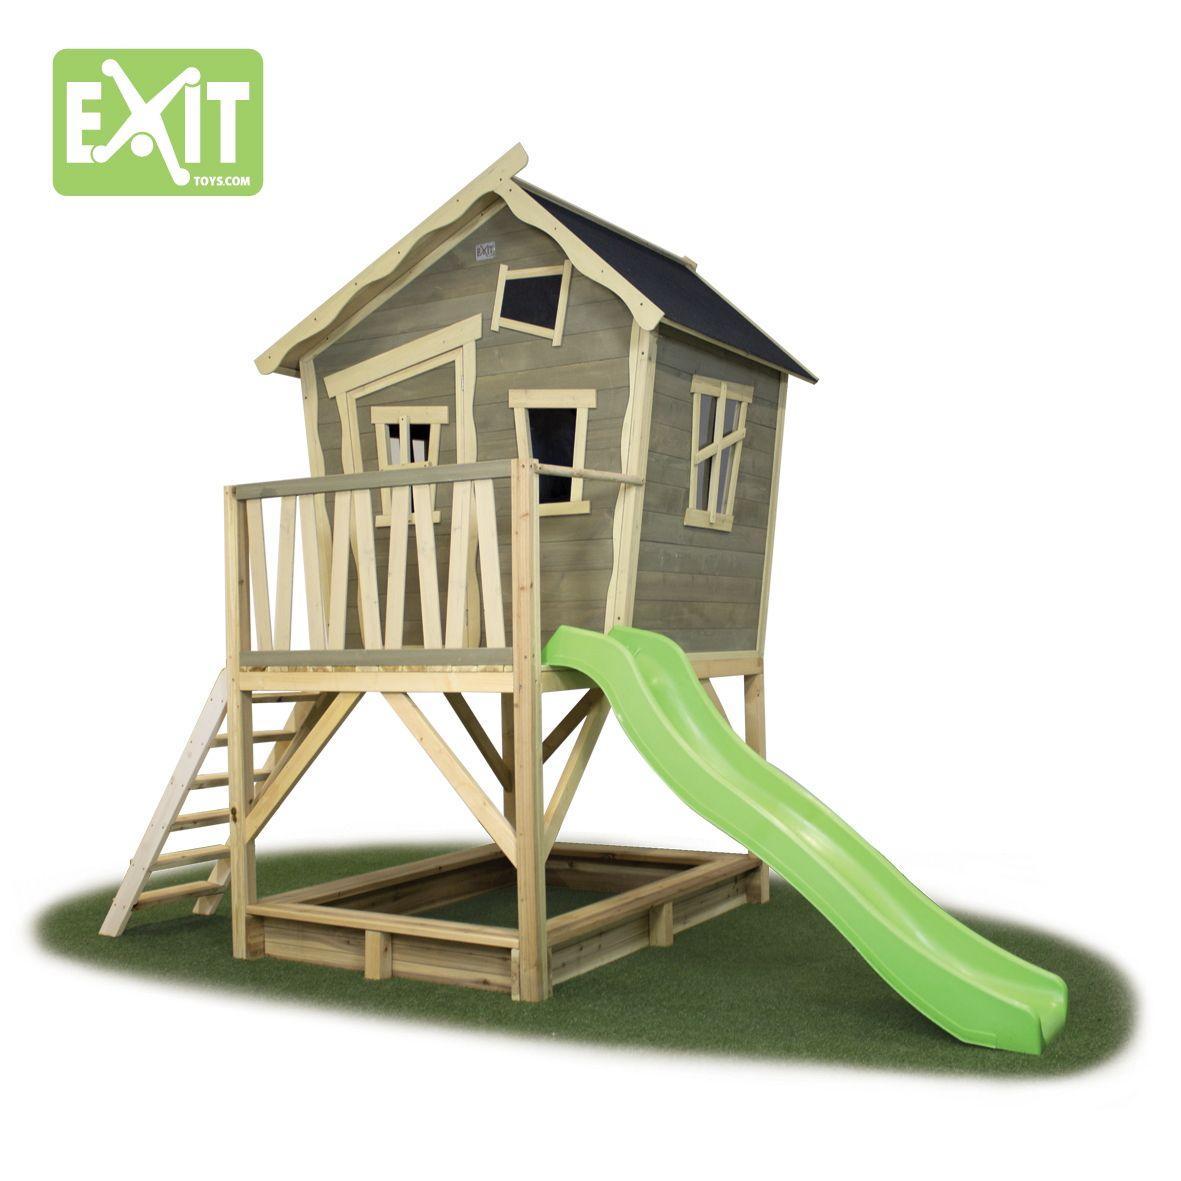 kinder-spielhaus exit crooky 500 kinderspielhaus holz-stelzenhaus, Moderne